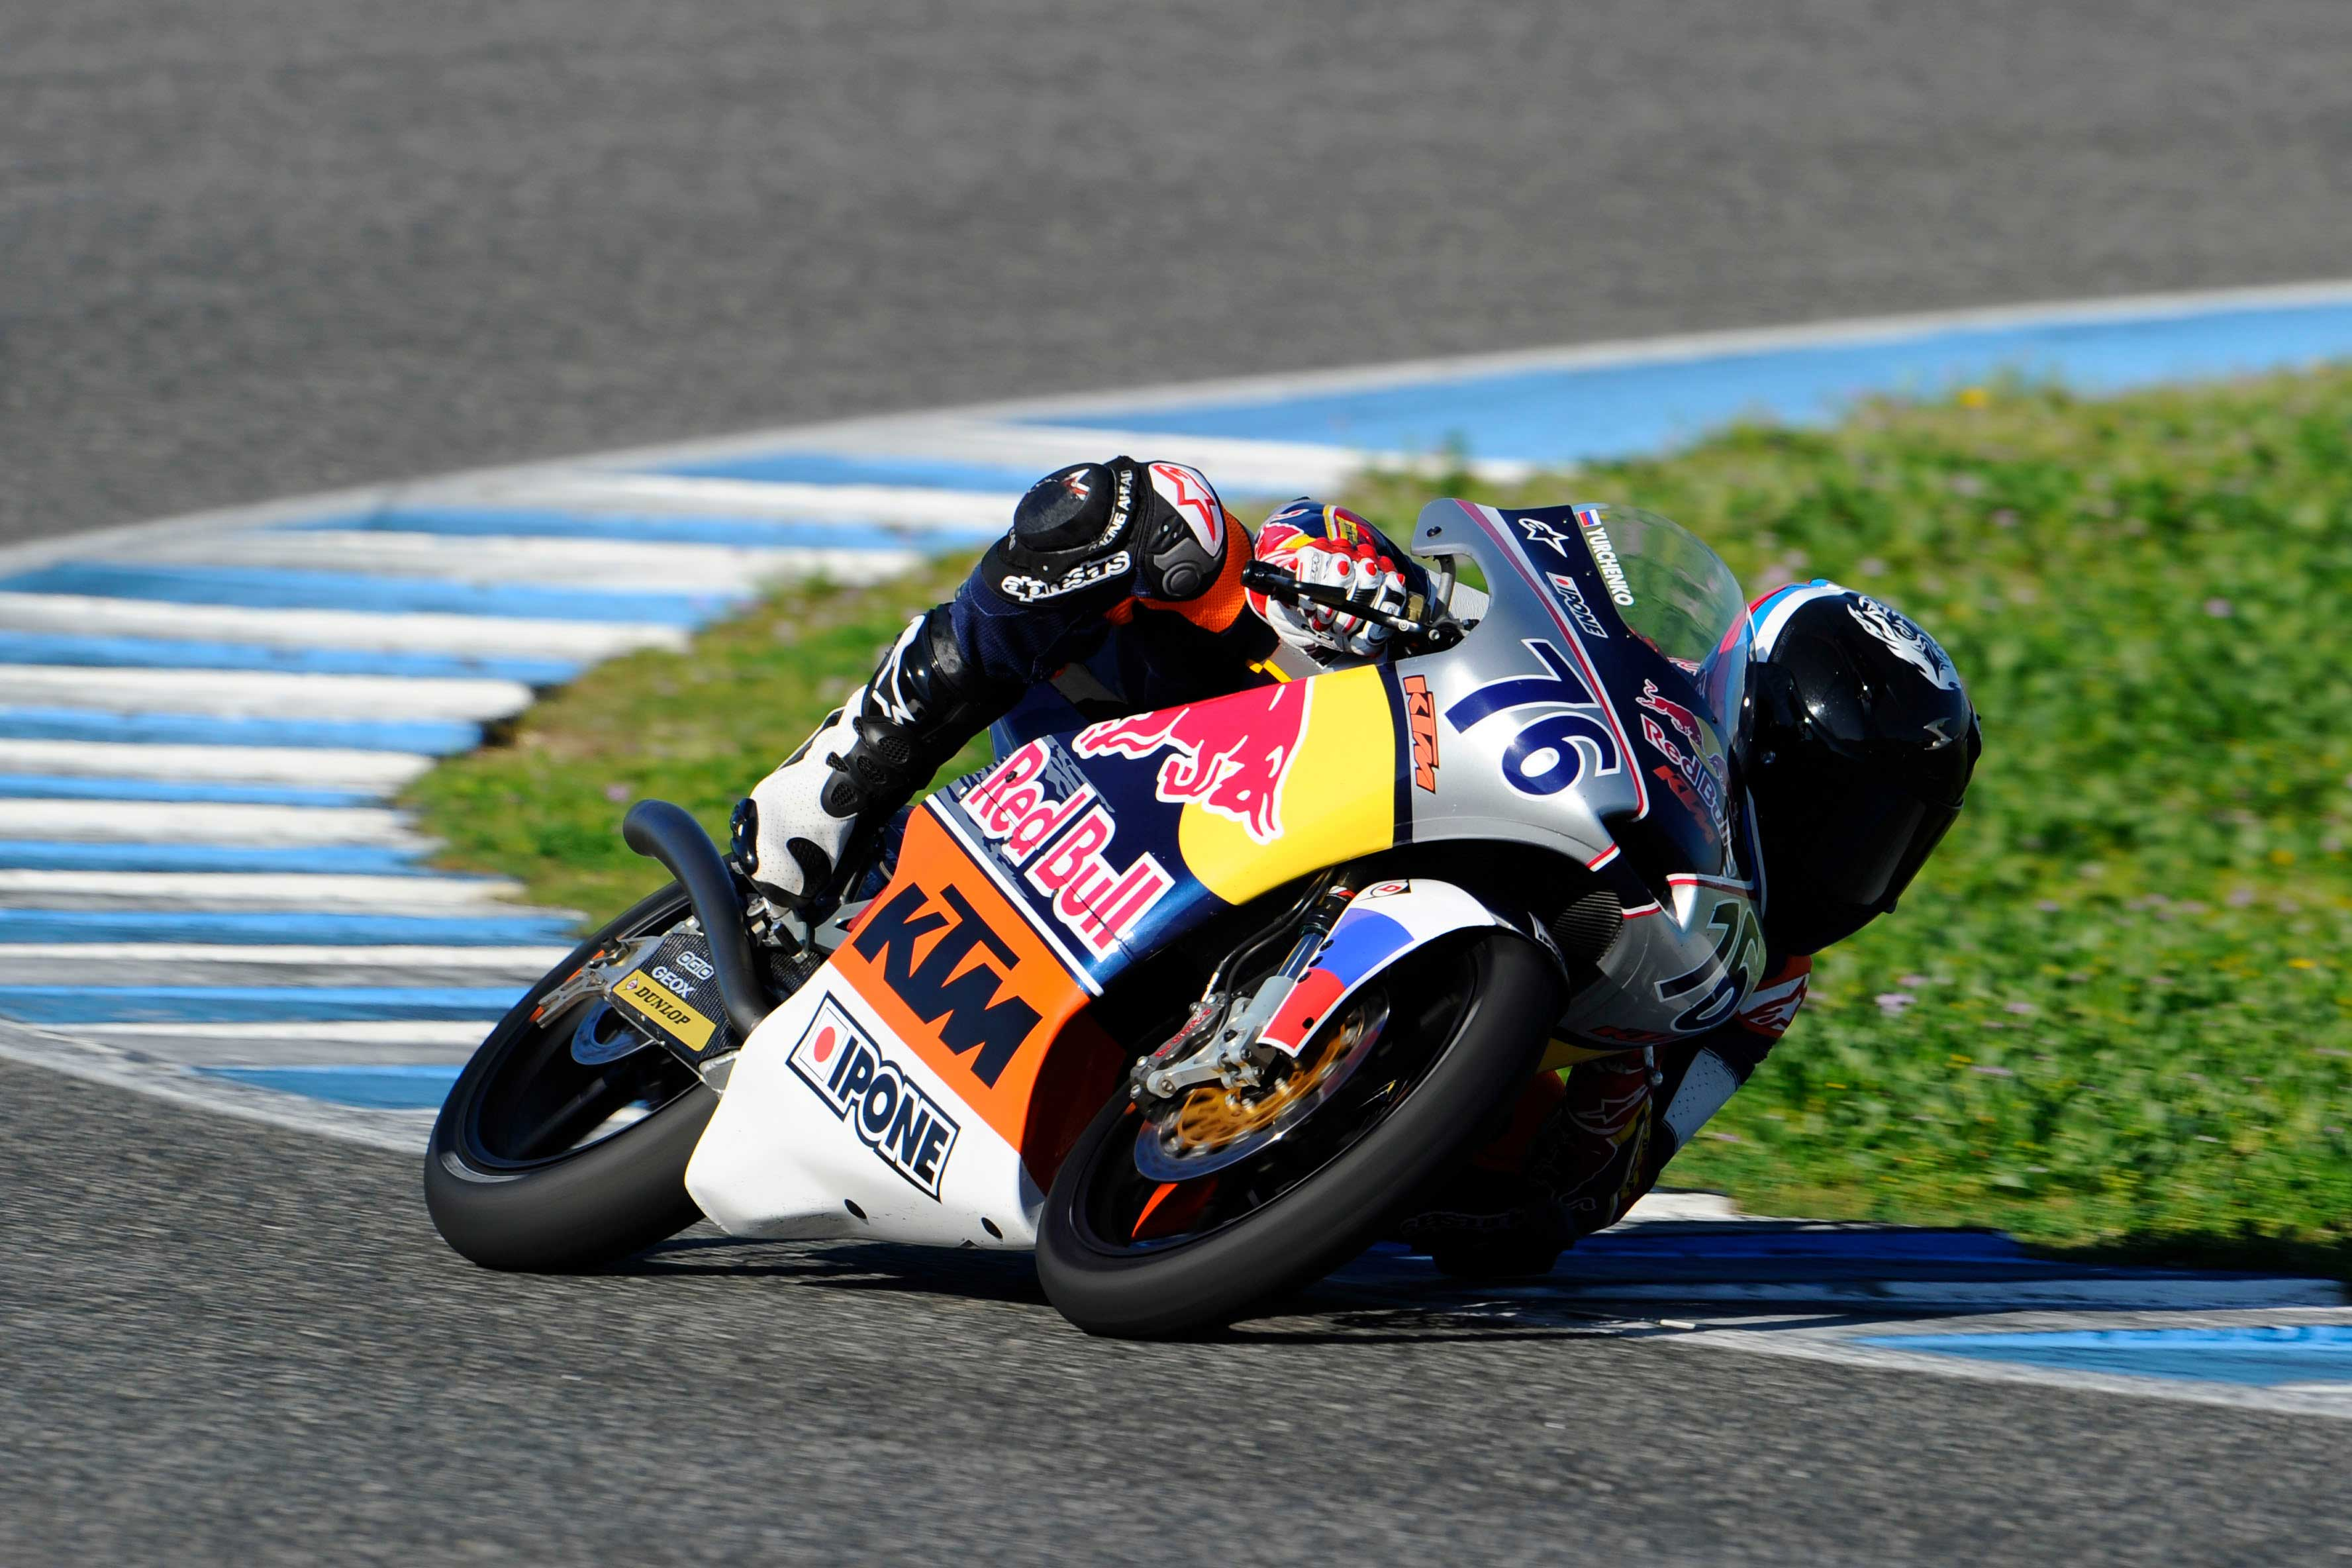 Makar Yurchenko Red Bull MotoGP Rookies Cup 2015 (2)